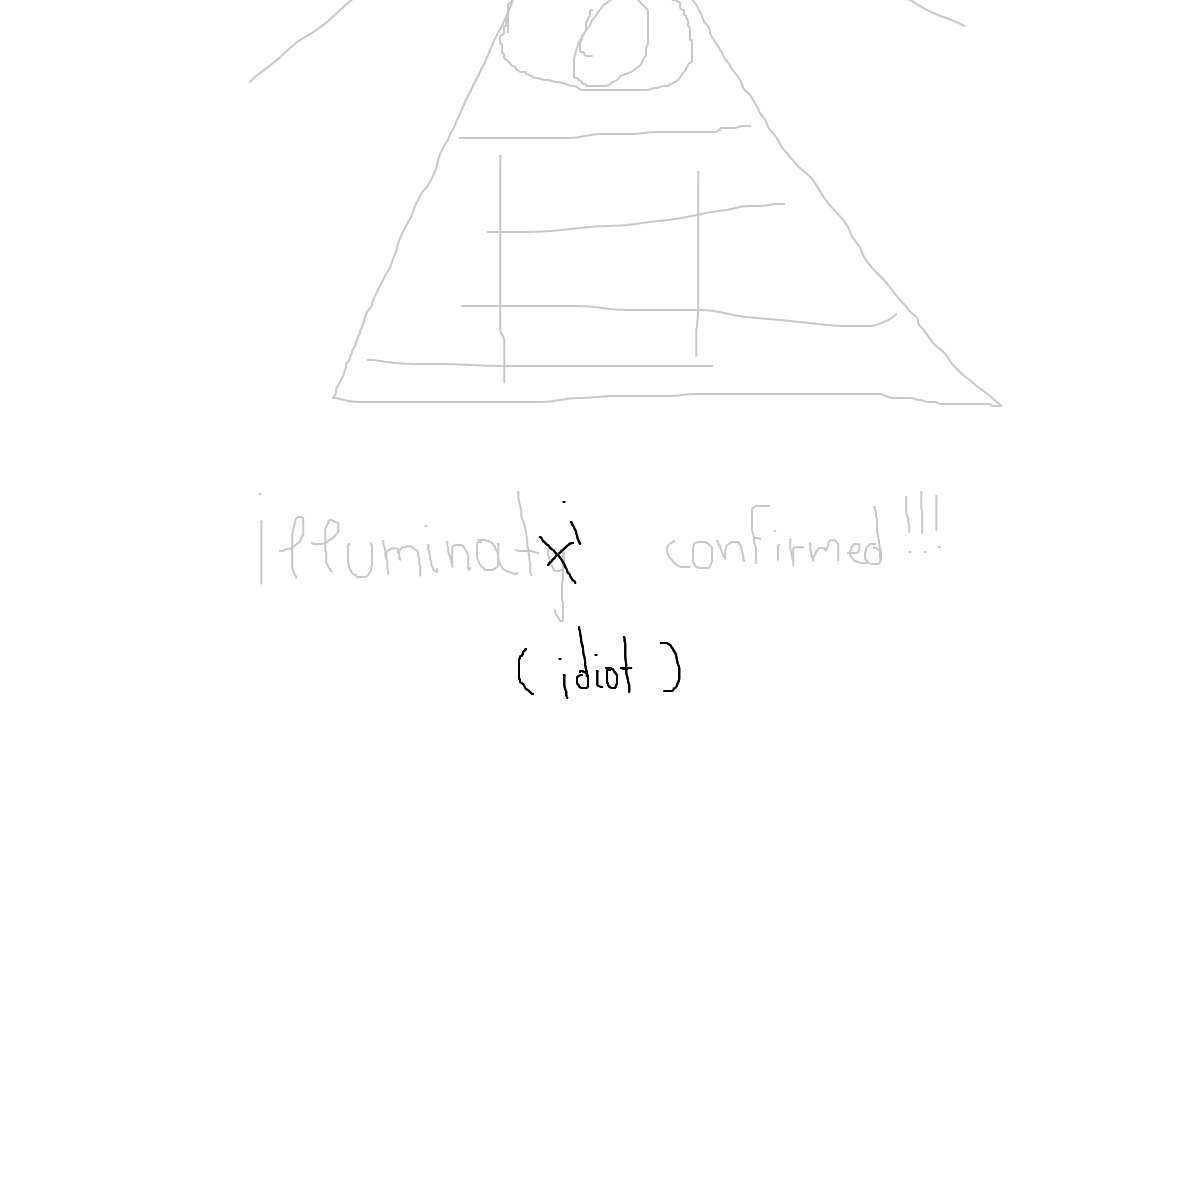 BAAAM drawing#6591 lat:45.4361381530761700lng: -75.6949691772461000